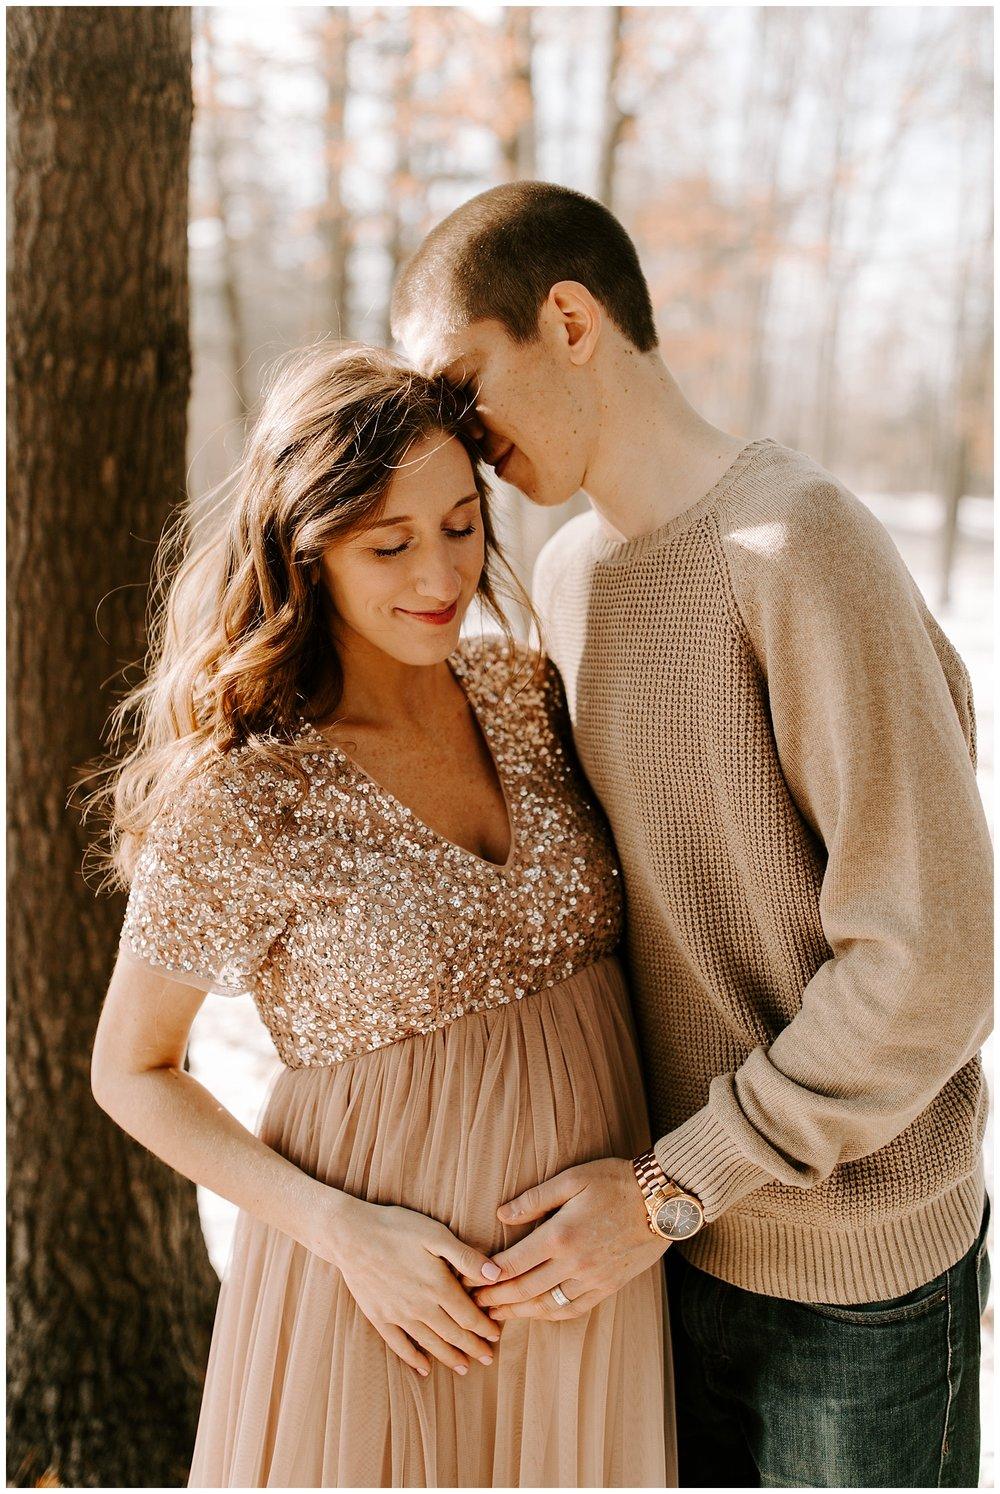 Becca+Grant-Maternity-107_WEB.jpg